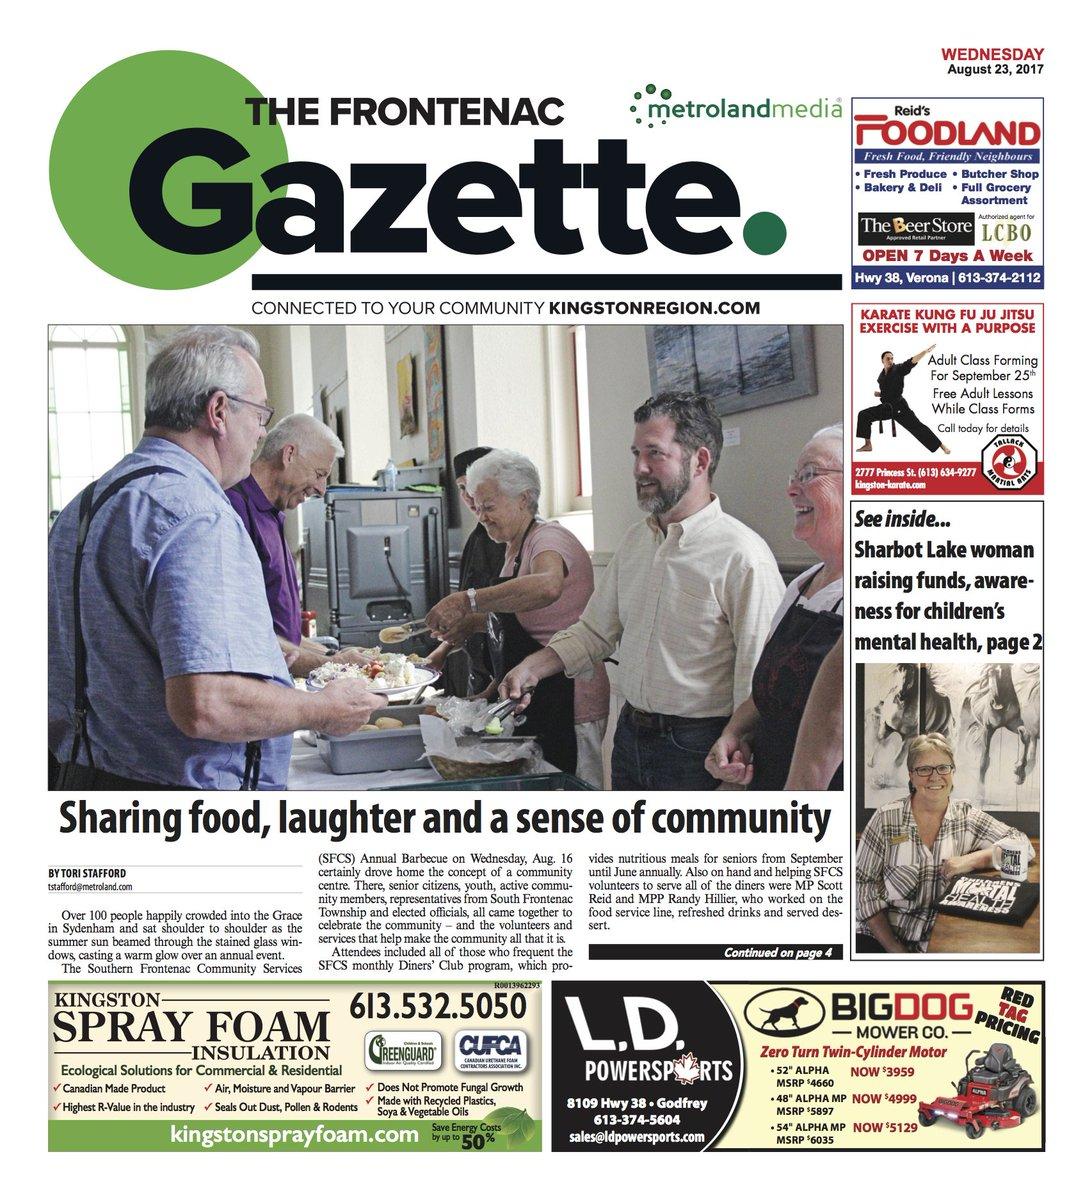 The Gazette has a brand new FB page! You&#39;ll make my day by giving it a like :-)  https://www. facebook.com/Frontenac-Gaze tte-114116359222334/?pnref=story &nbsp; …  … #ygk @SFrontenac @FrontenacCounty<br>http://pic.twitter.com/F1zIiBbKA0